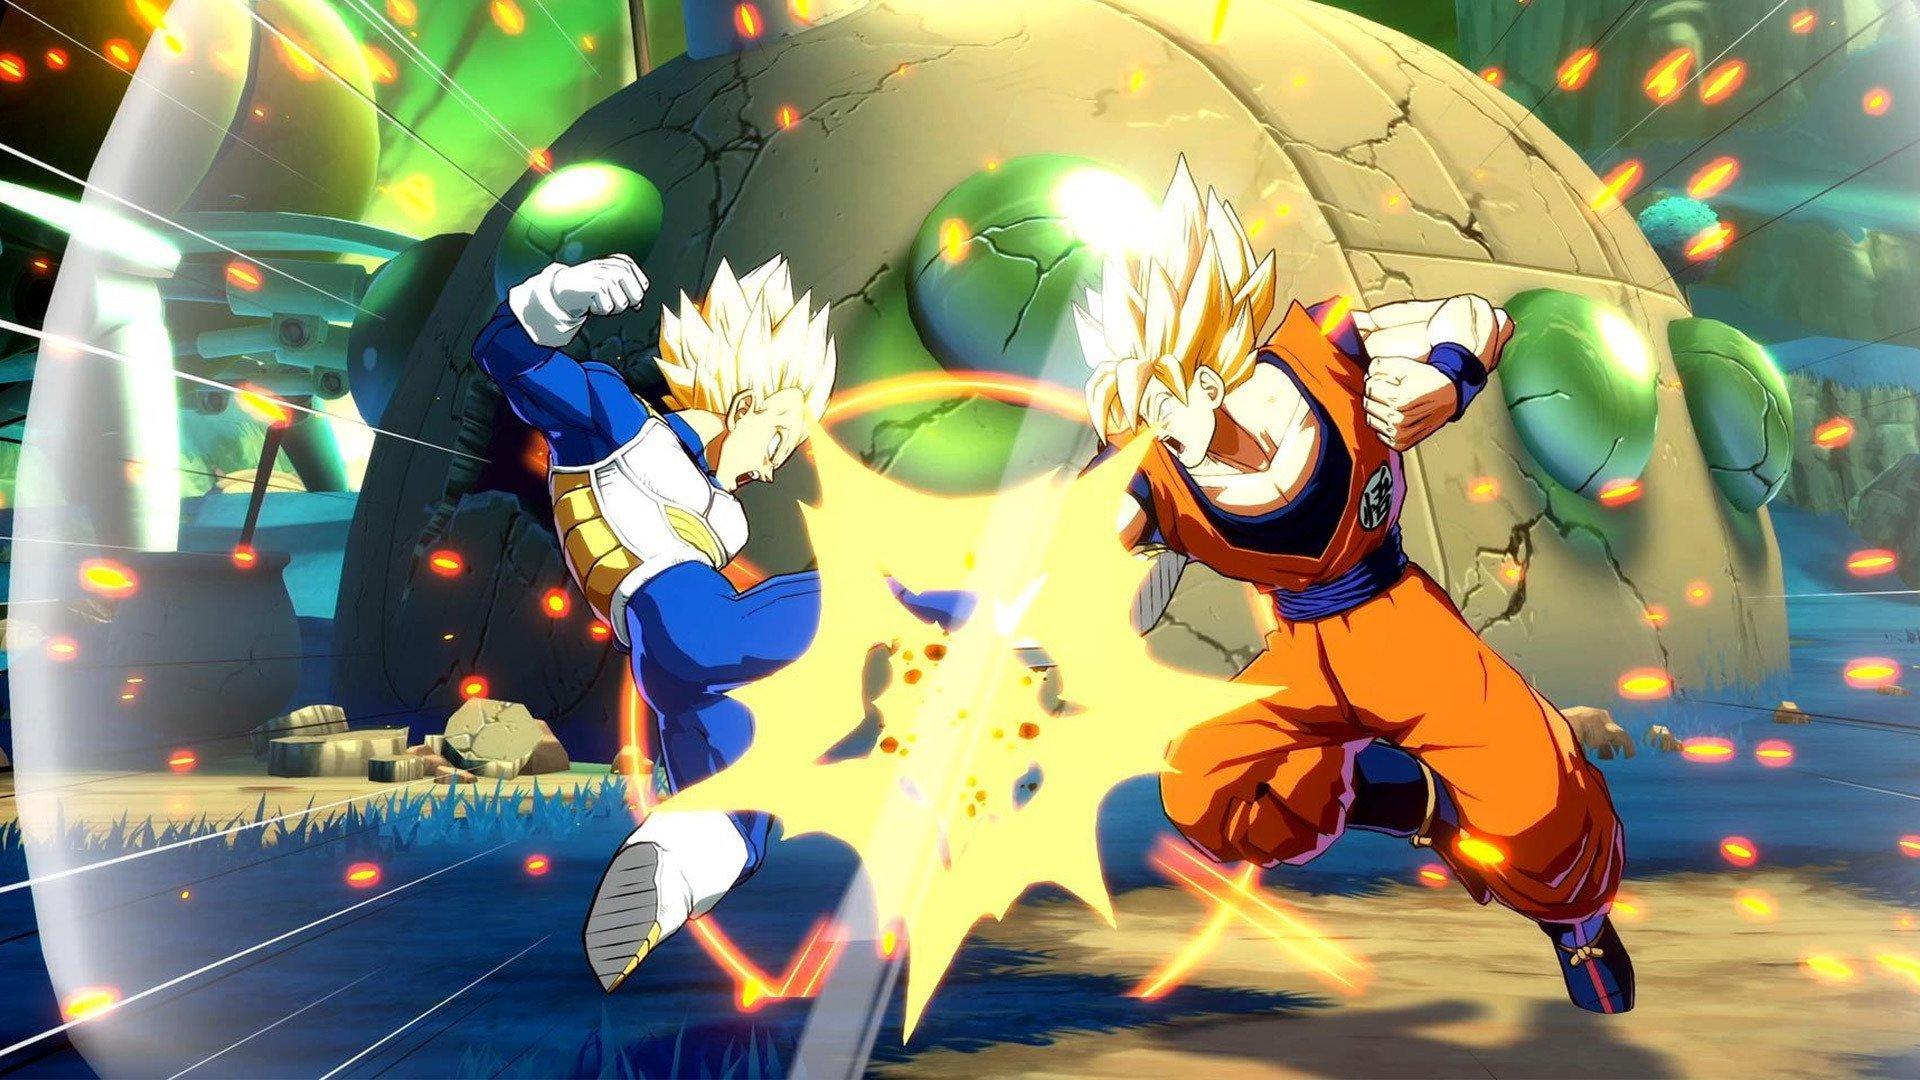 Video Game - Dragon Ball FighterZ  Wallpaper